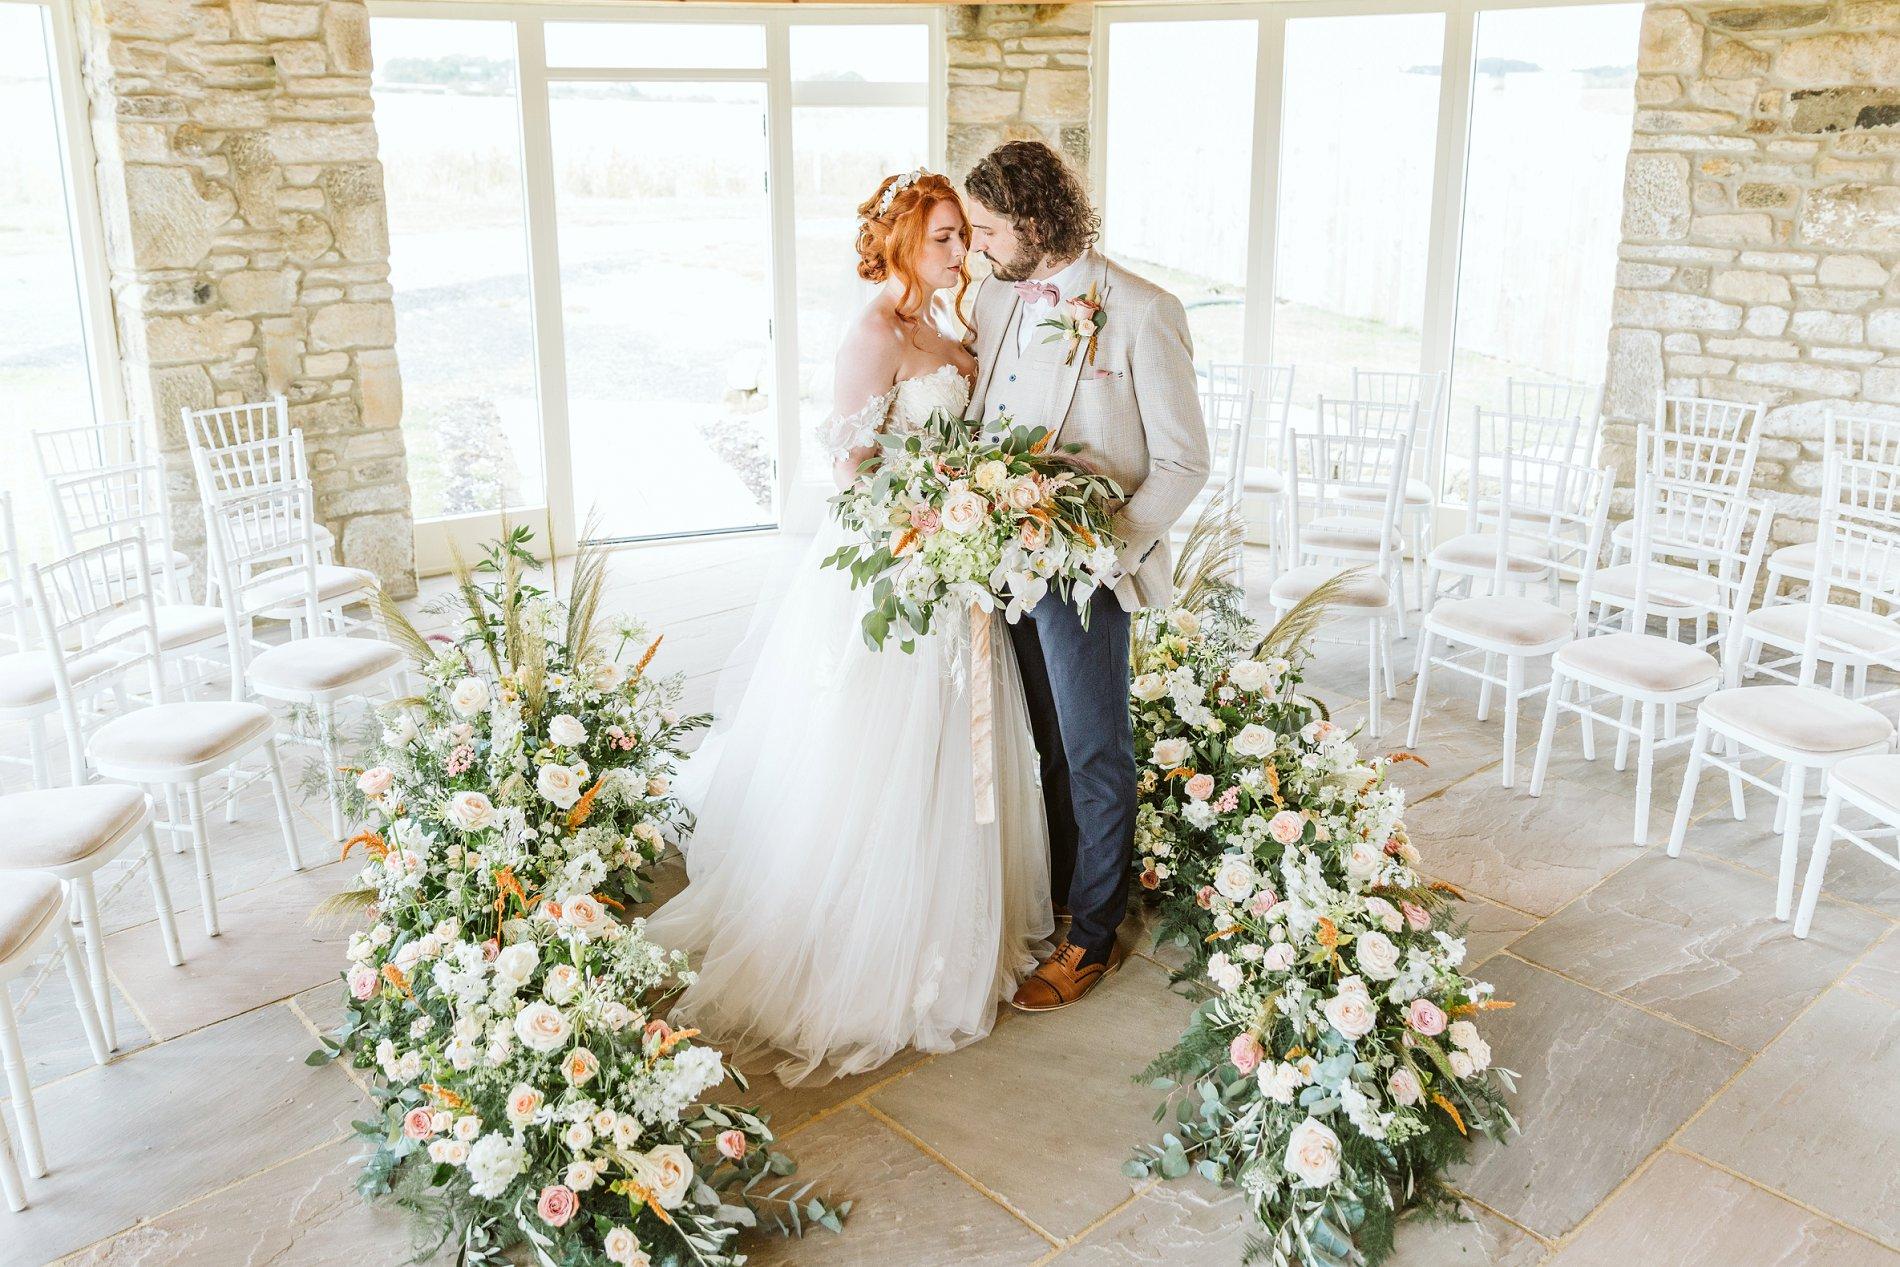 Saying I Do Rustic Wedding Creative Shoot (c) Charlotte Eve Photography (13)